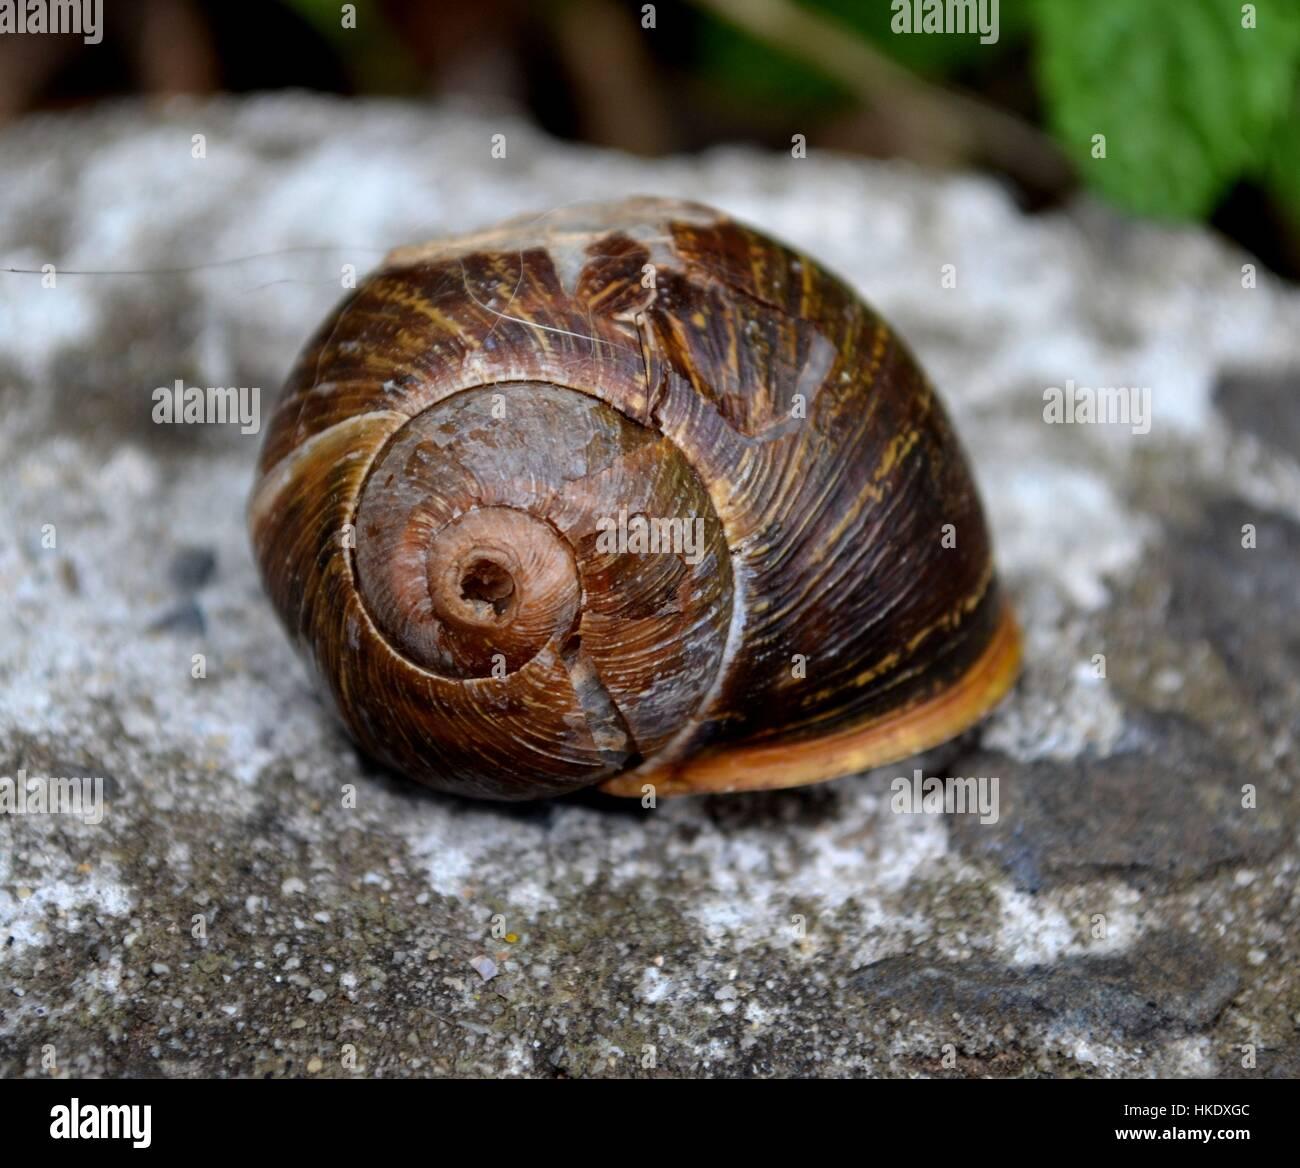 Close up broken snail shell - Stock Image